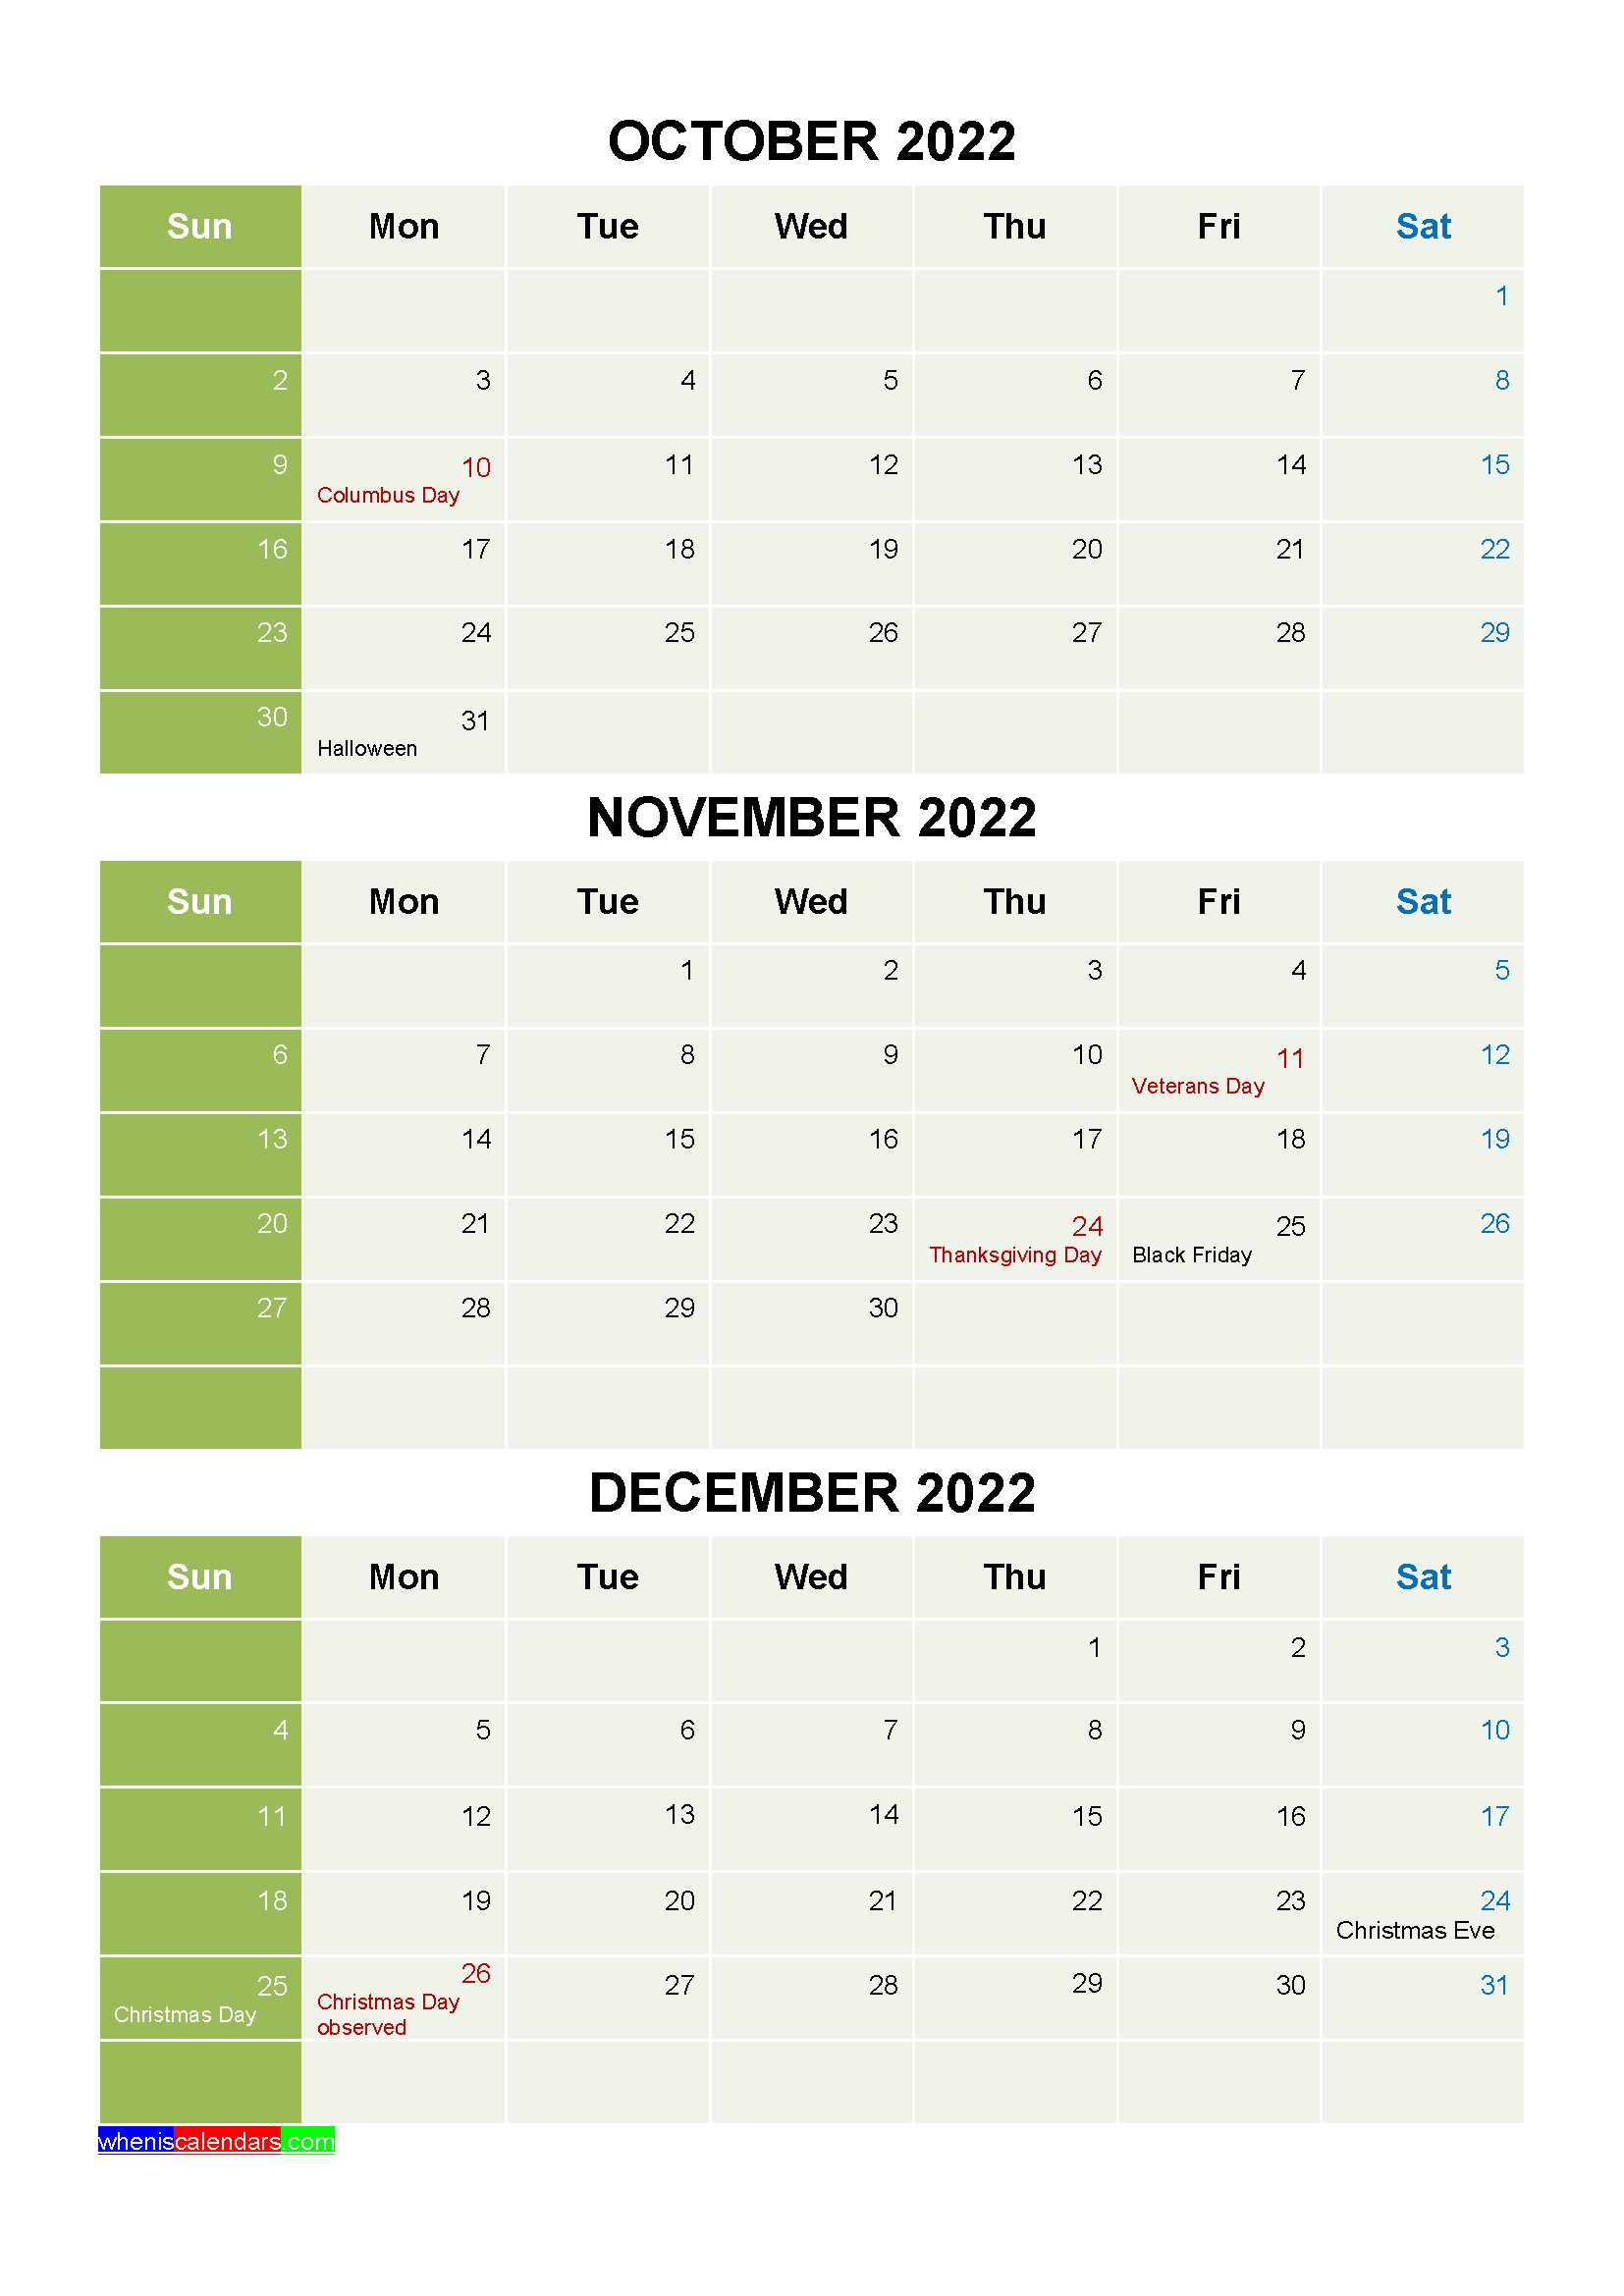 Free Calendar October November December 2022 with Holidays